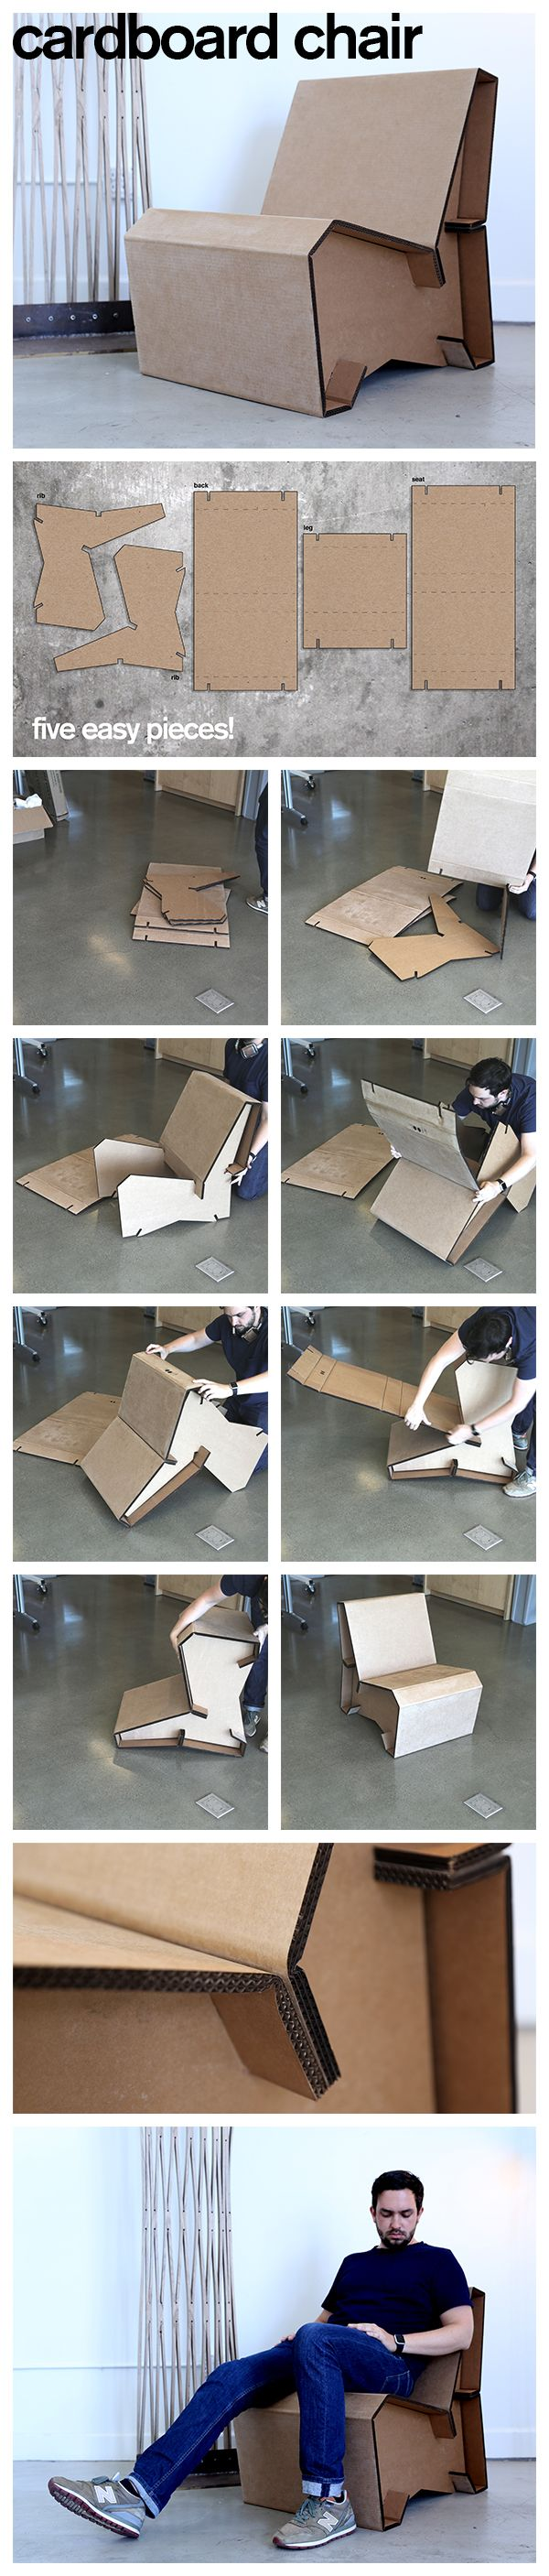 5 piece cardboard lounge chair manualidades pinterest rh pinterest com